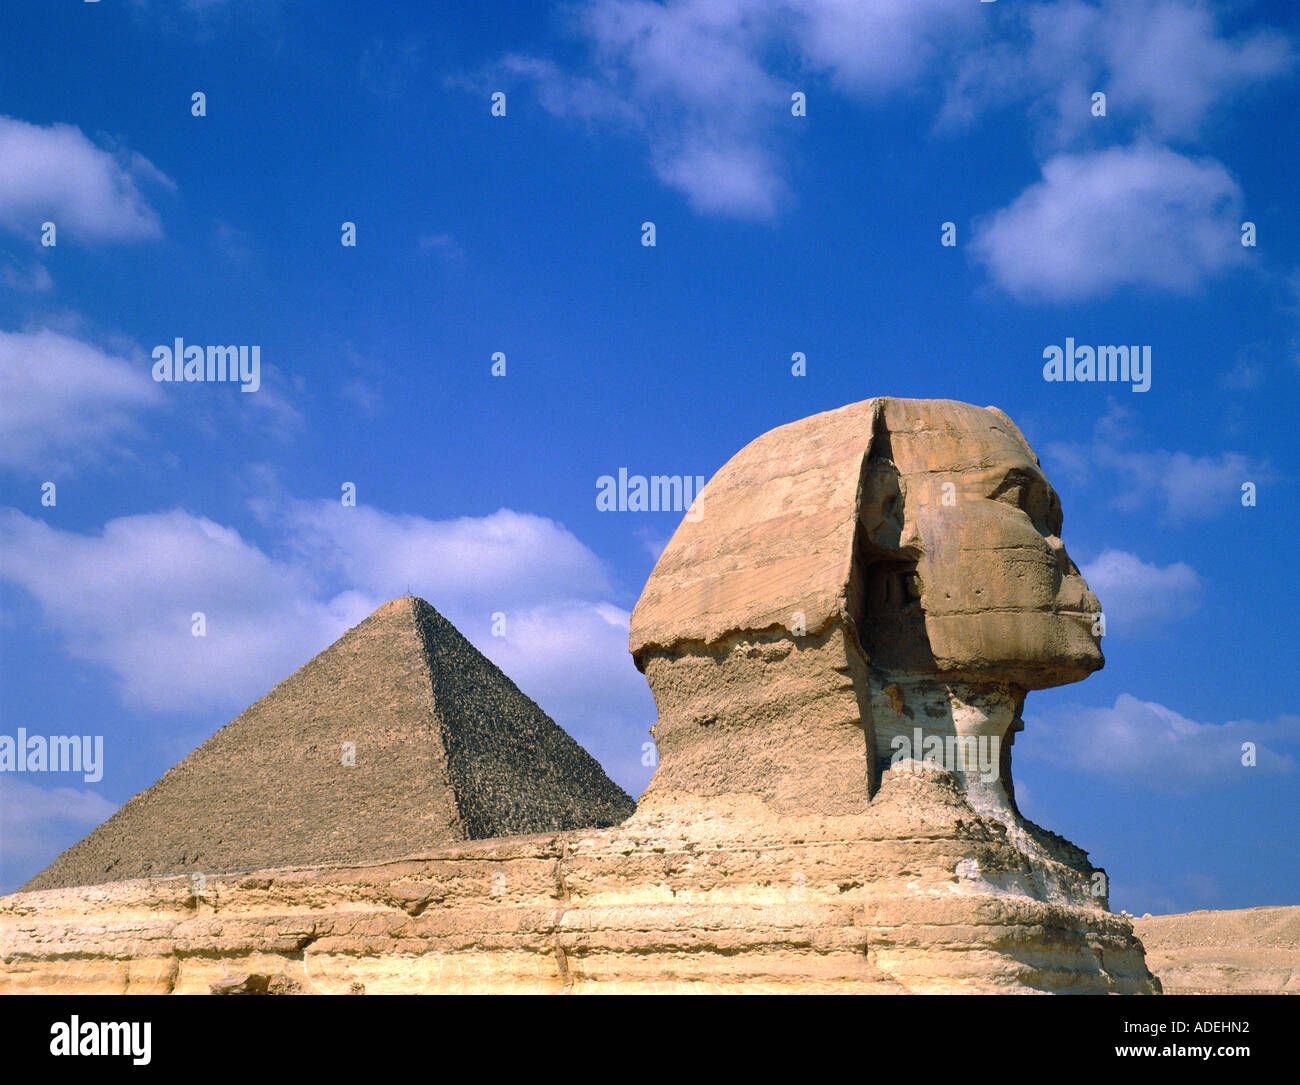 Egypt. Giza. Pyramid & Sphinx. - Stock Image